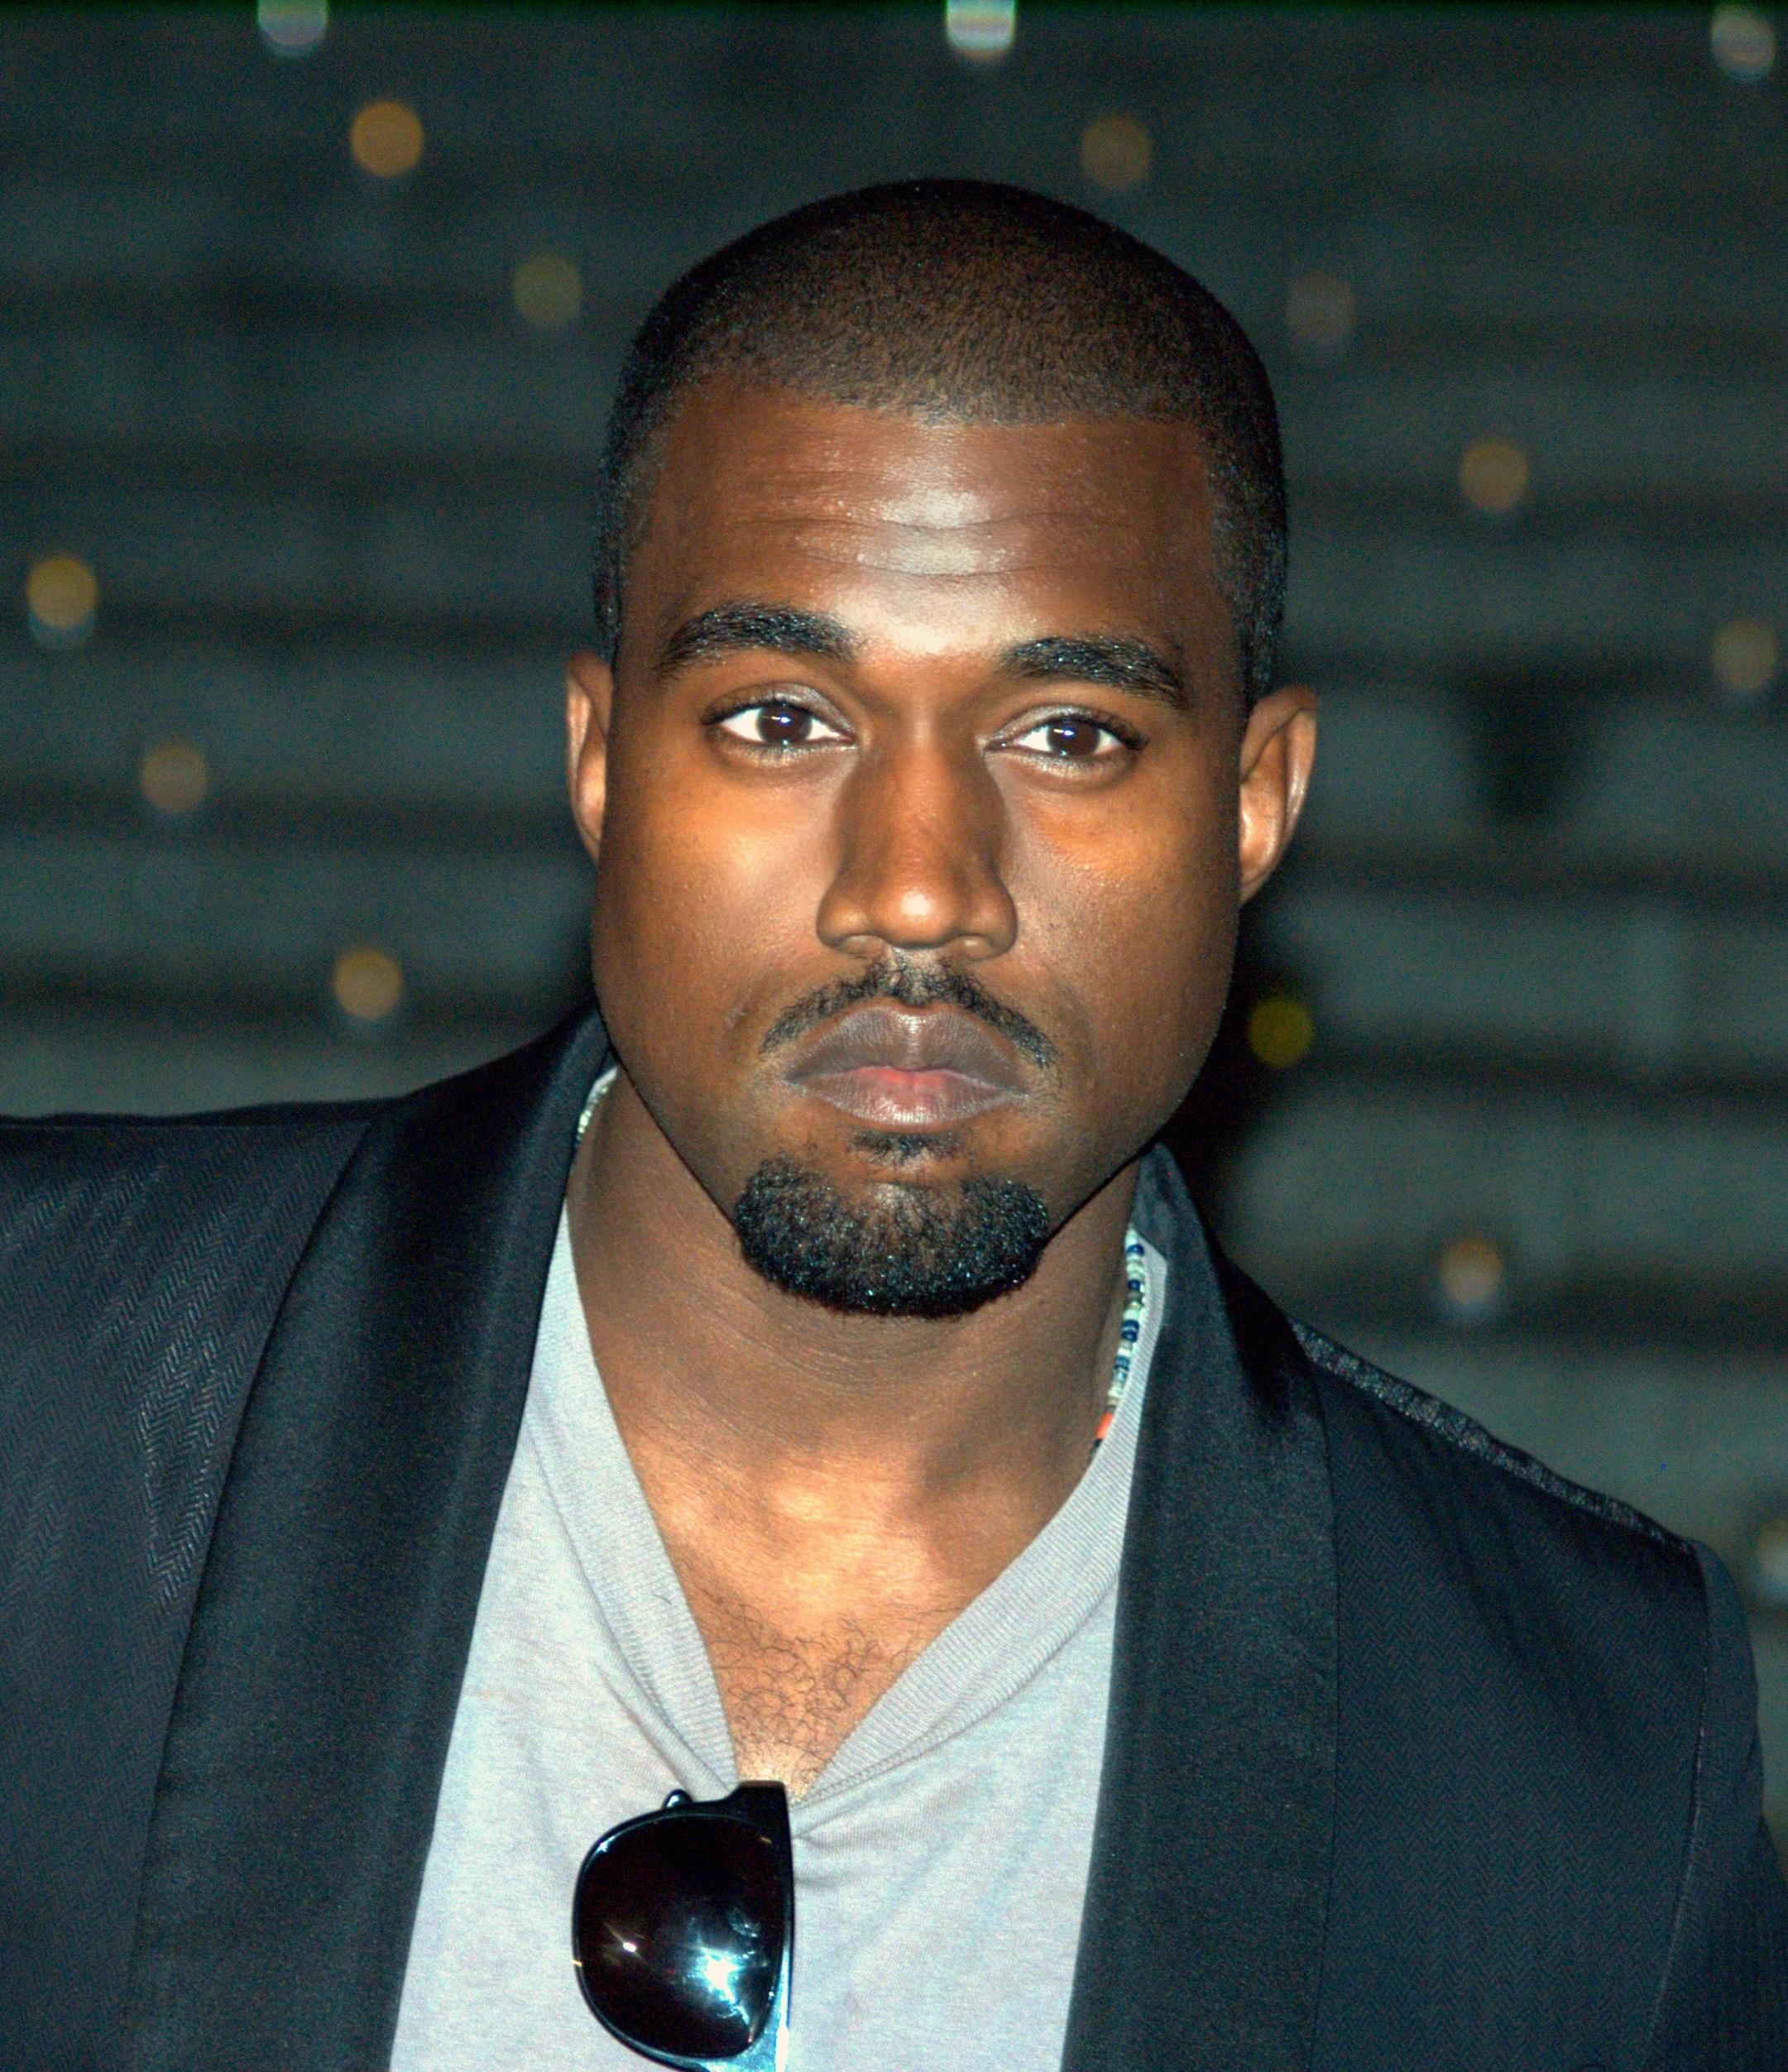 Kanye West (Source: Wikipedia)